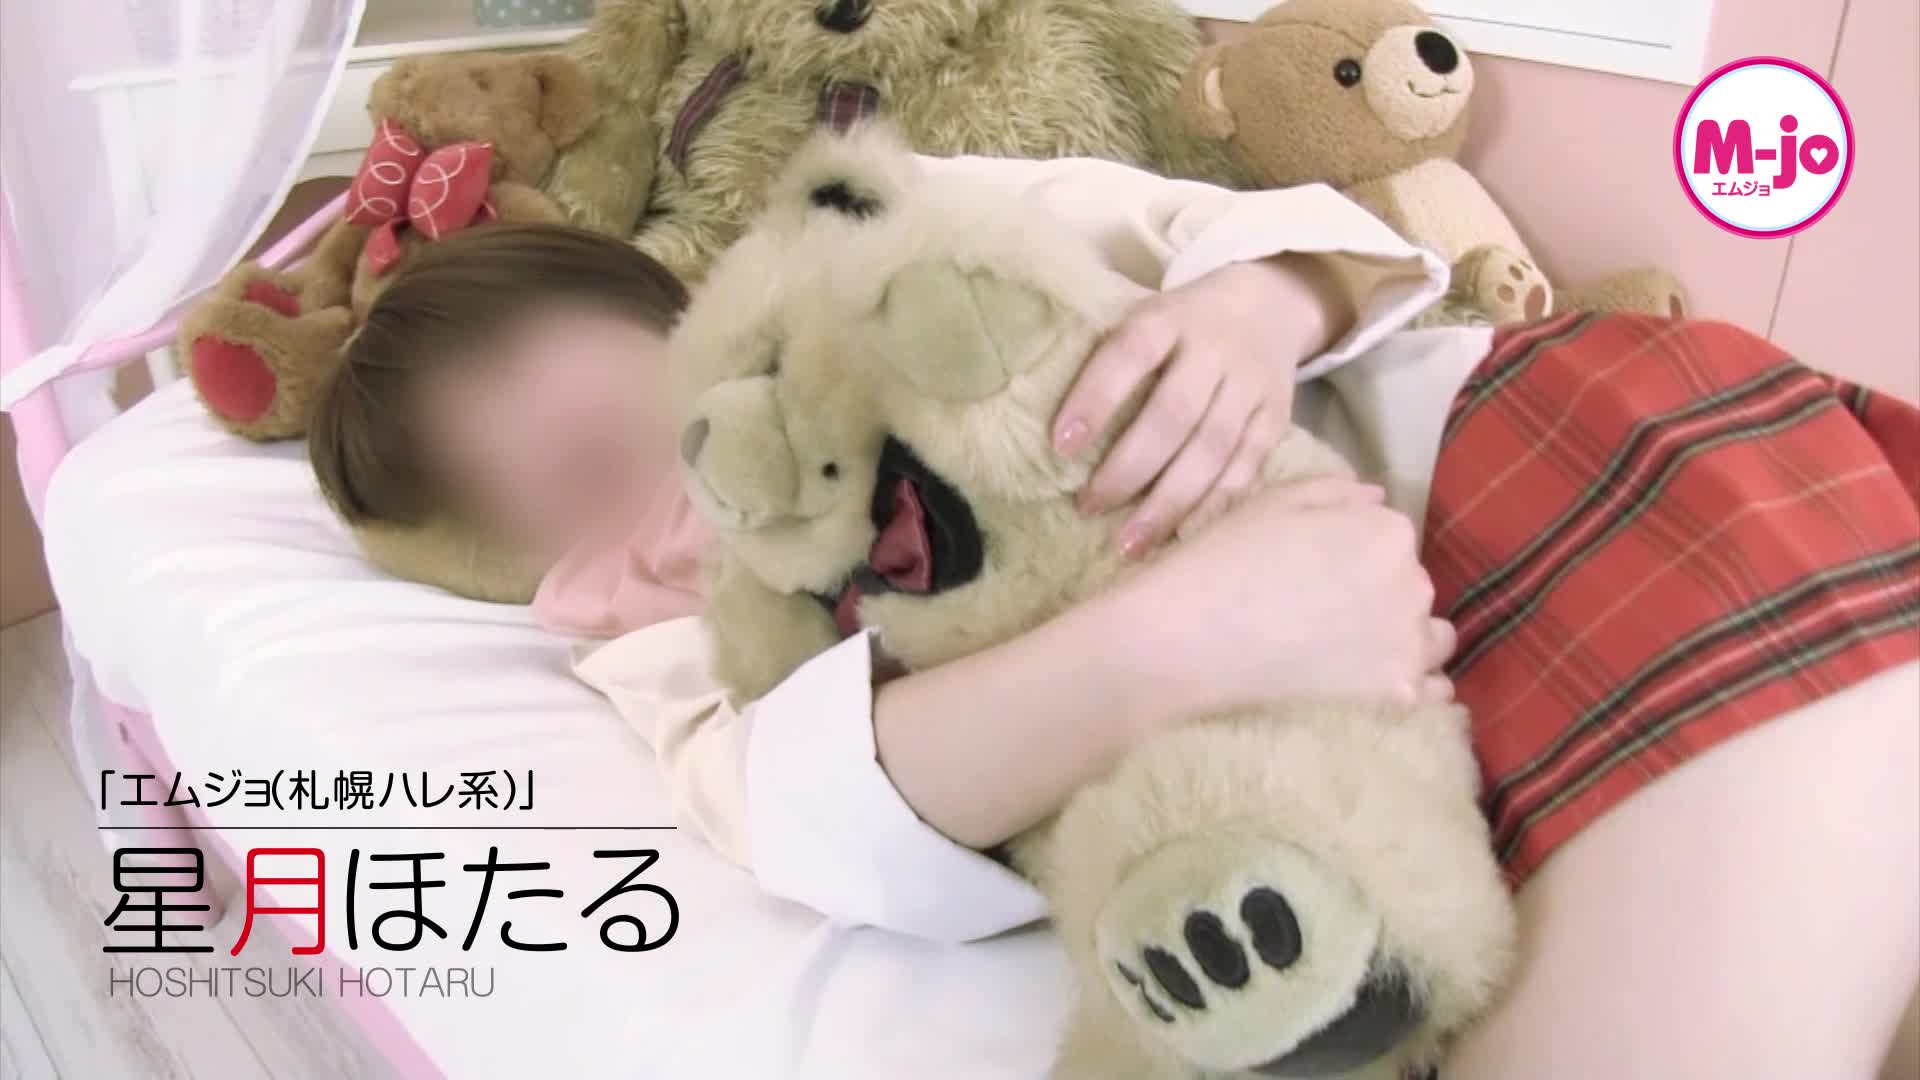 M-jo(札幌ハレ系)|風俗動画